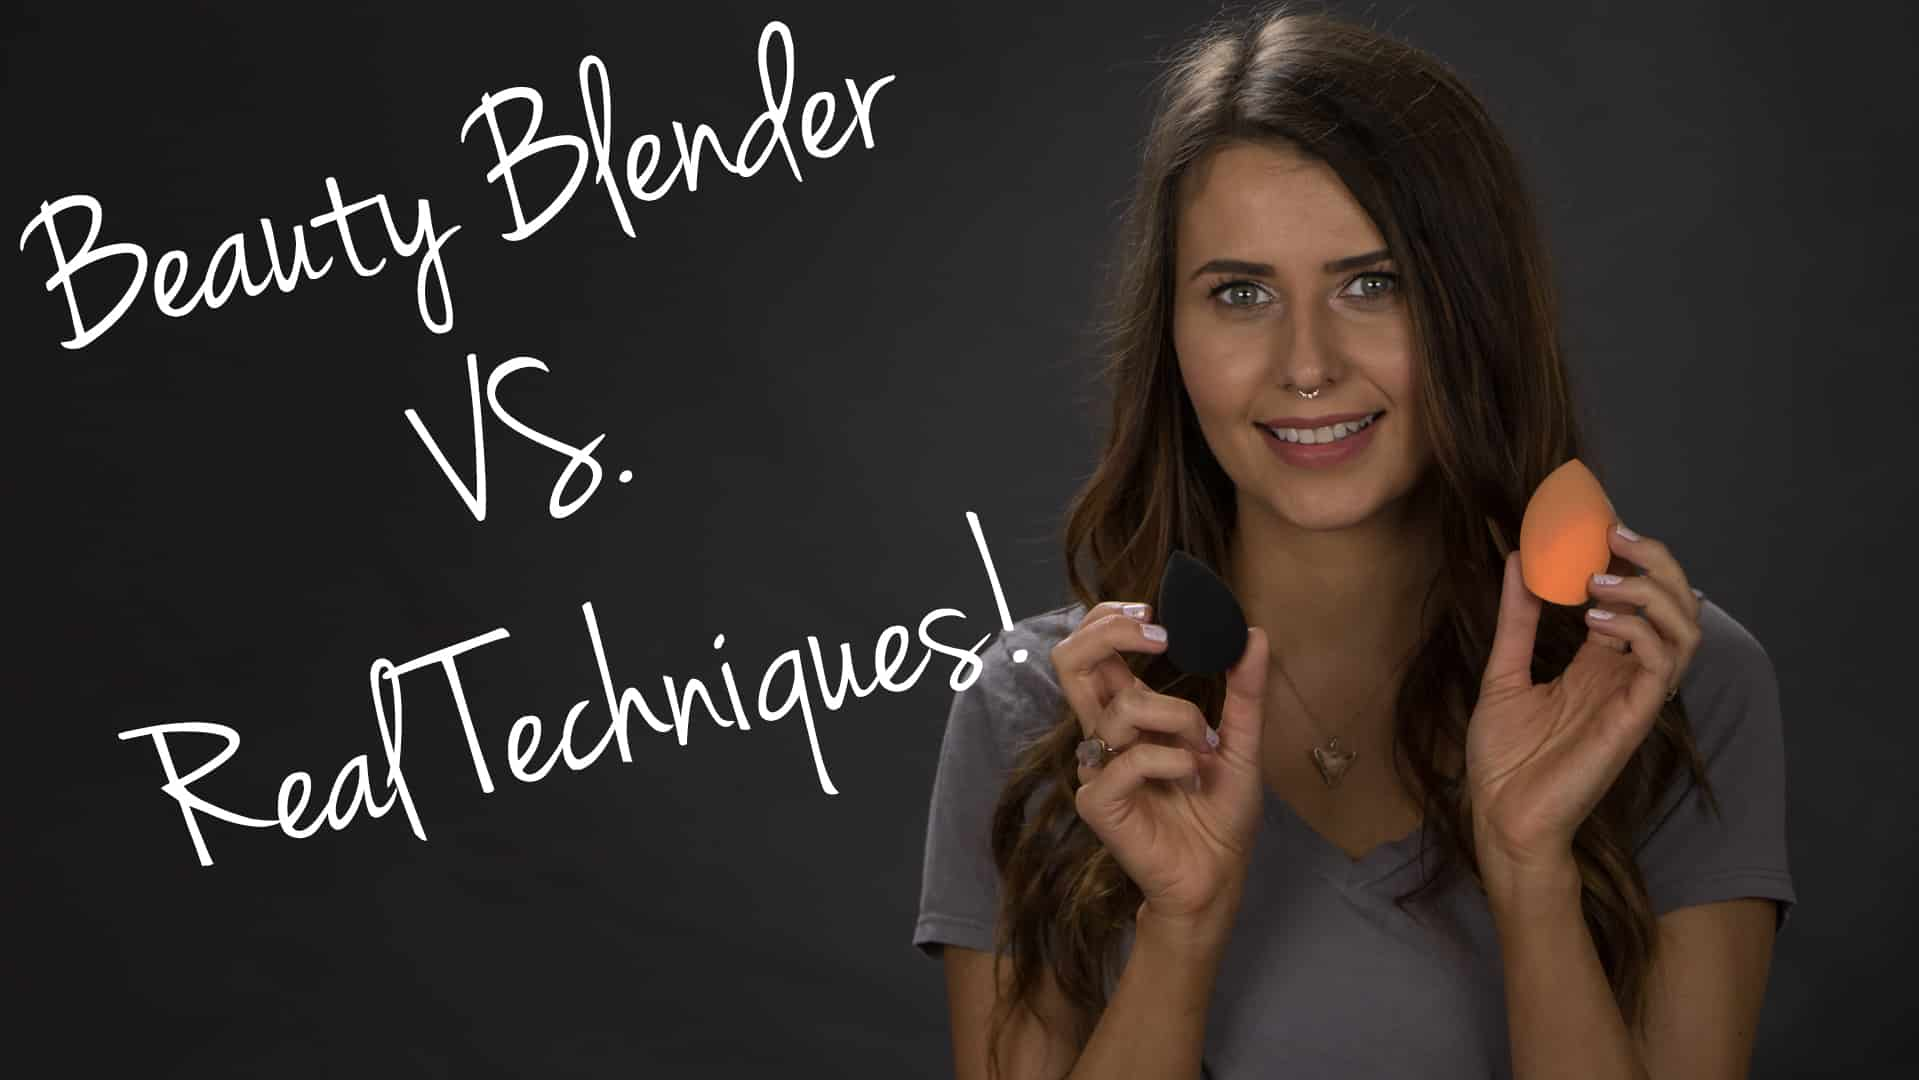 beautyblender & Real Techniques Comparison